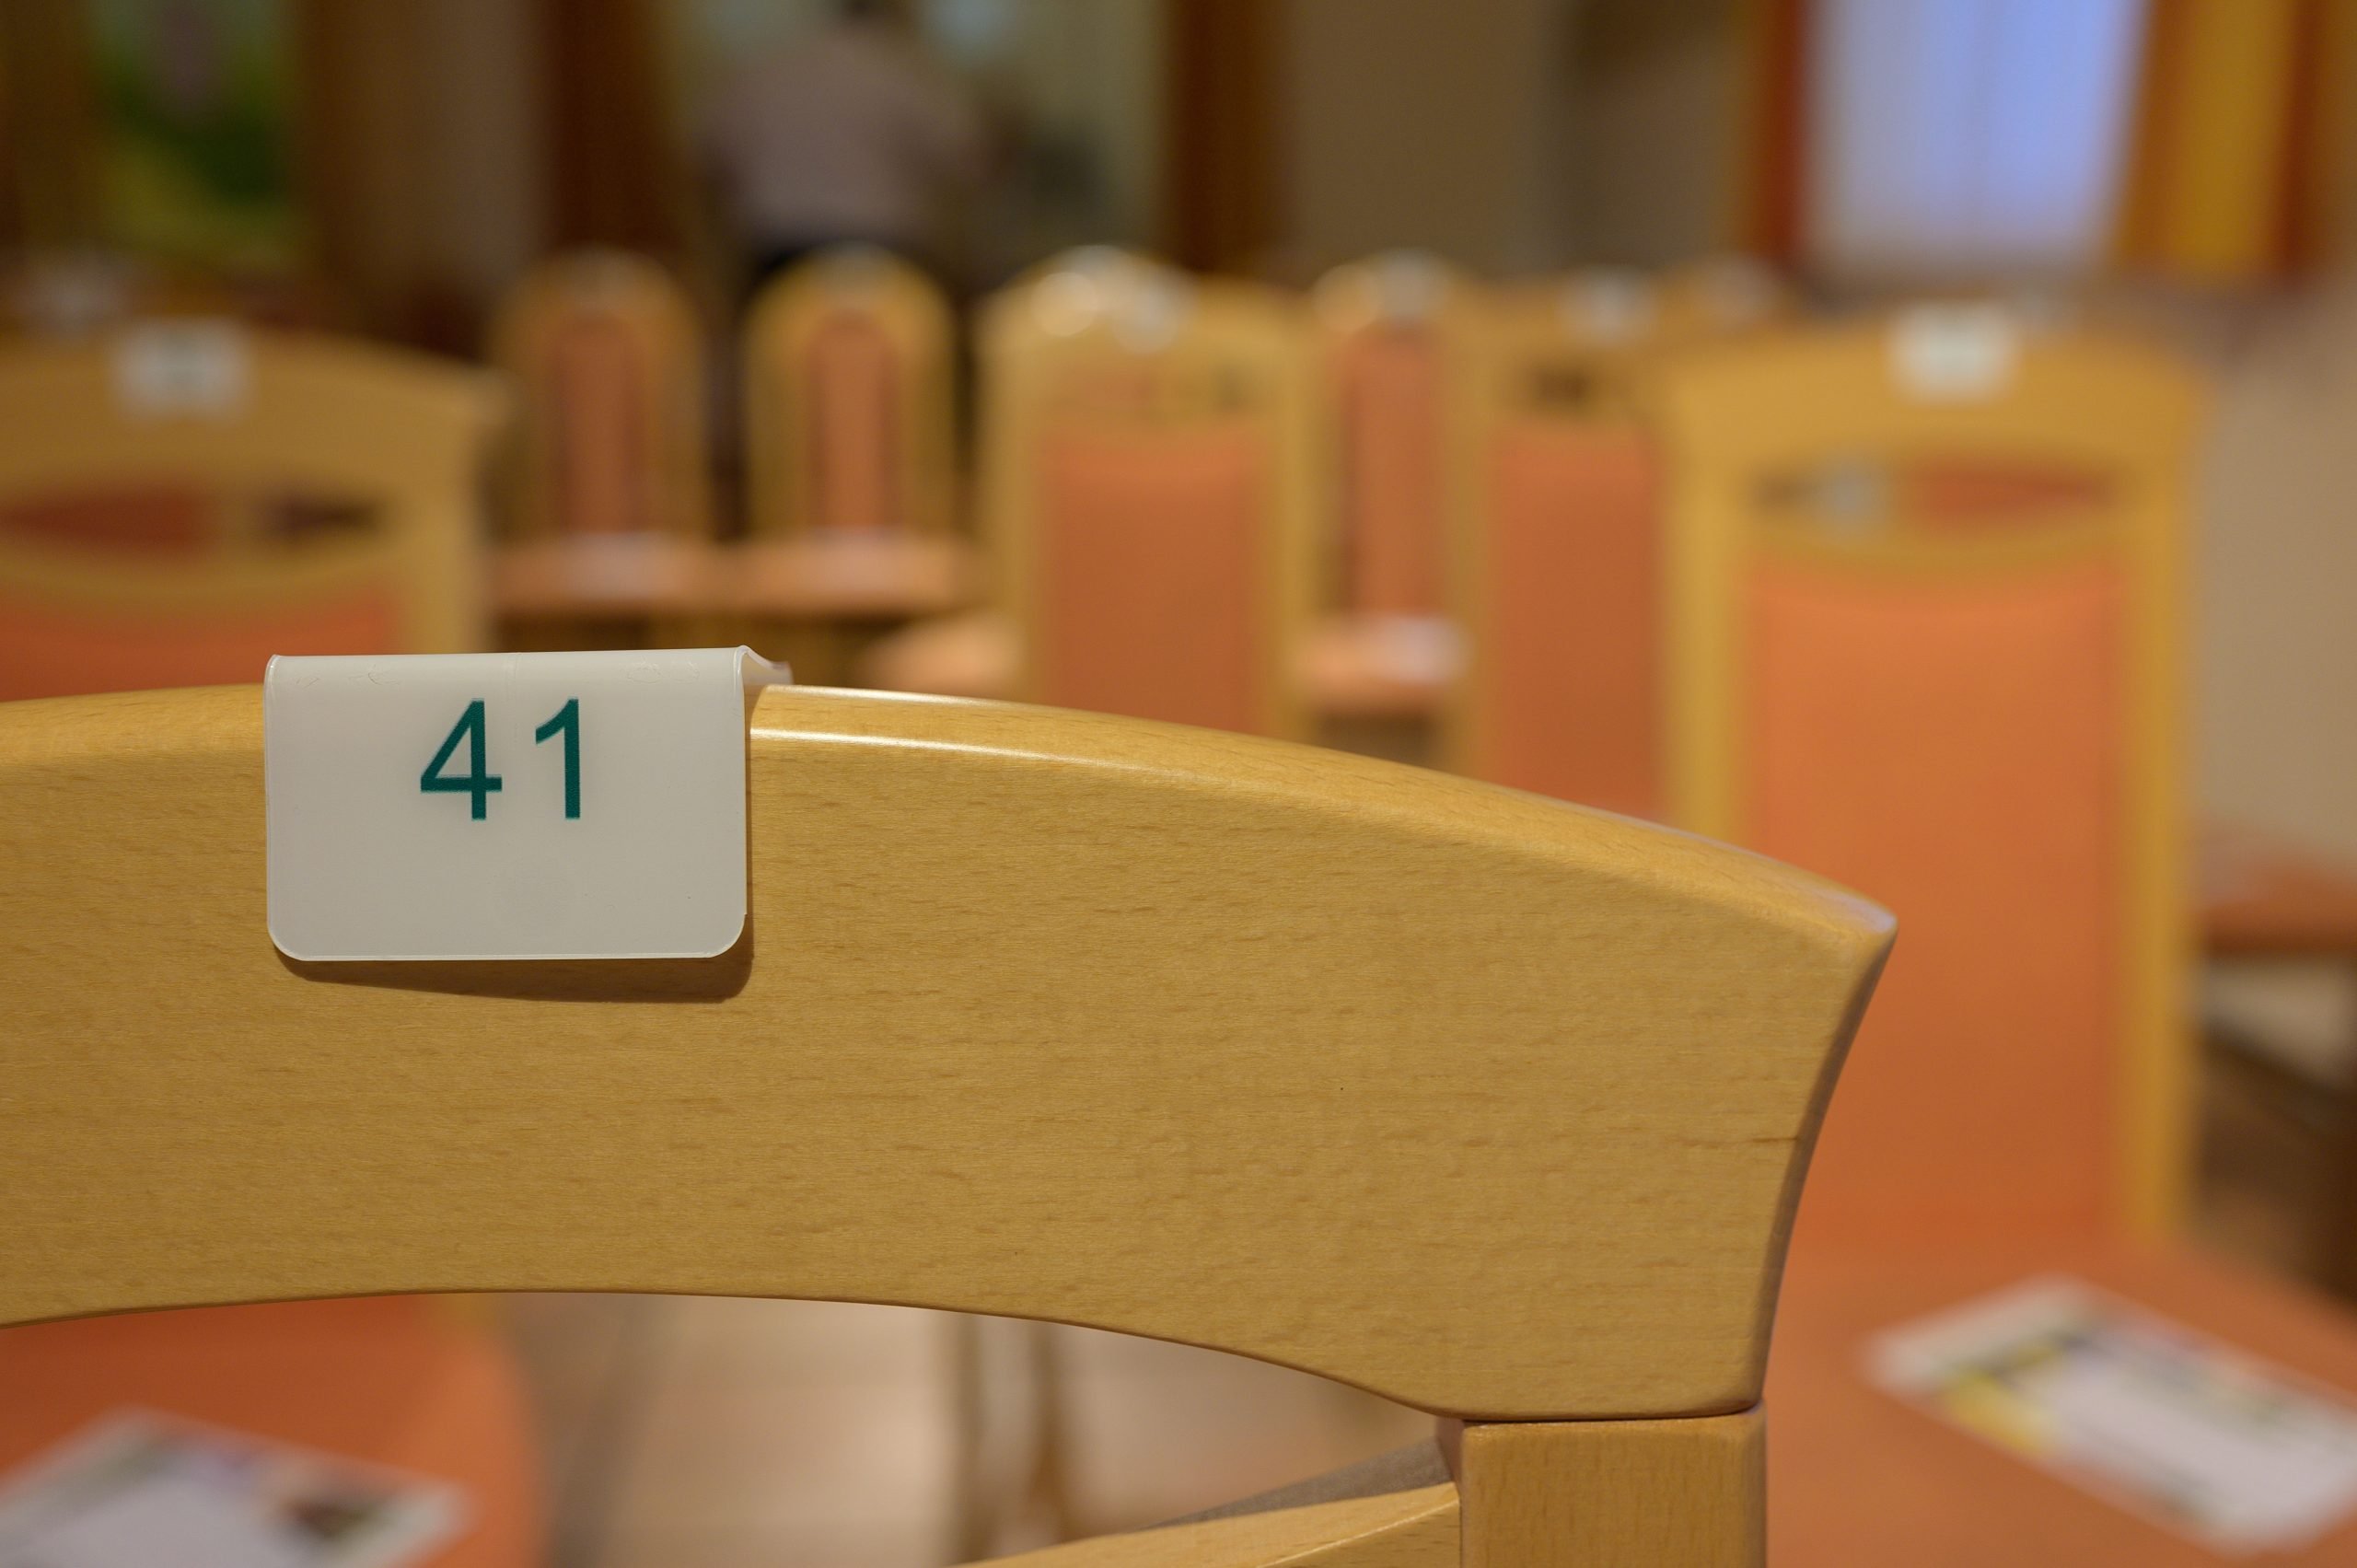 Sitzplatznummer